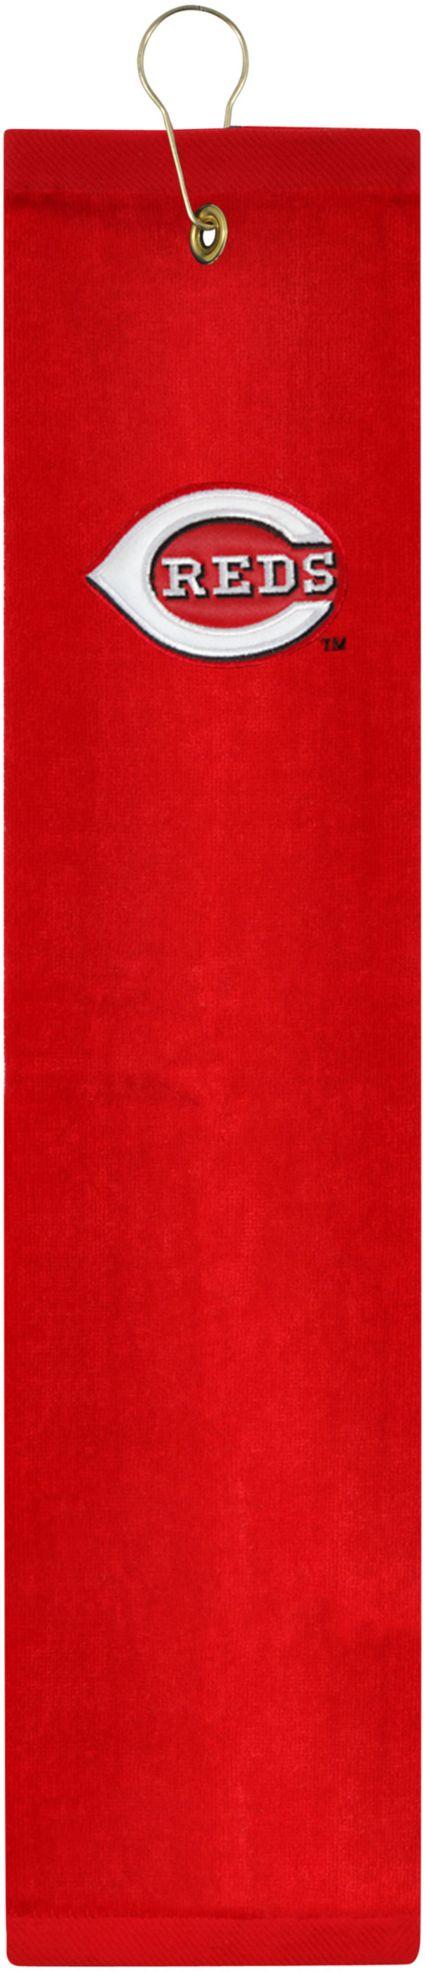 McArthur Sports Cincinnati Reds Embroidered Tri-Fold Towel